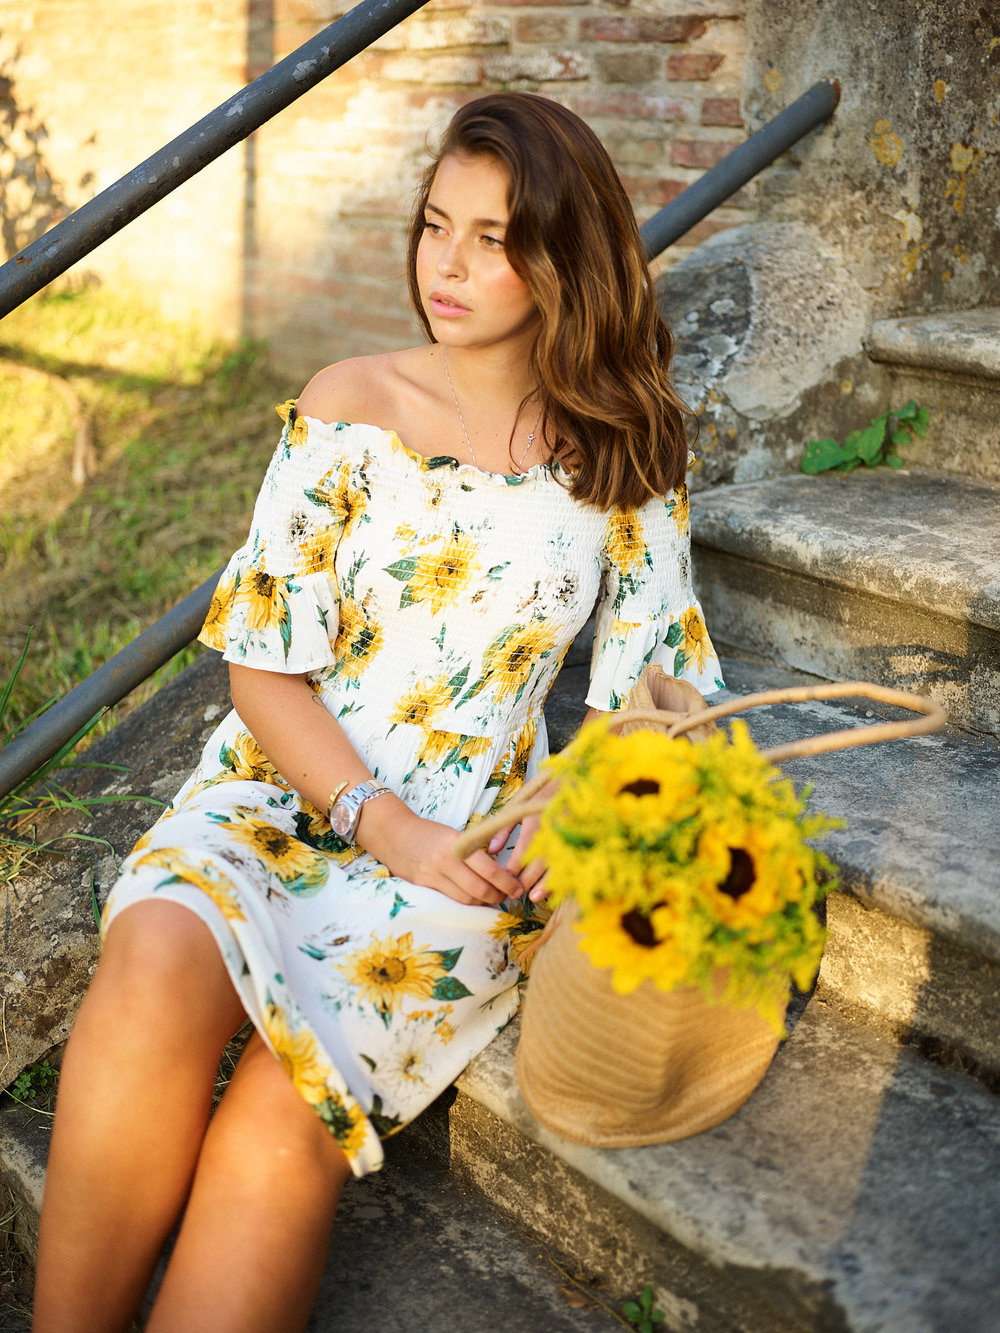 Deodoc-Toscana-Nicole-20.jpg